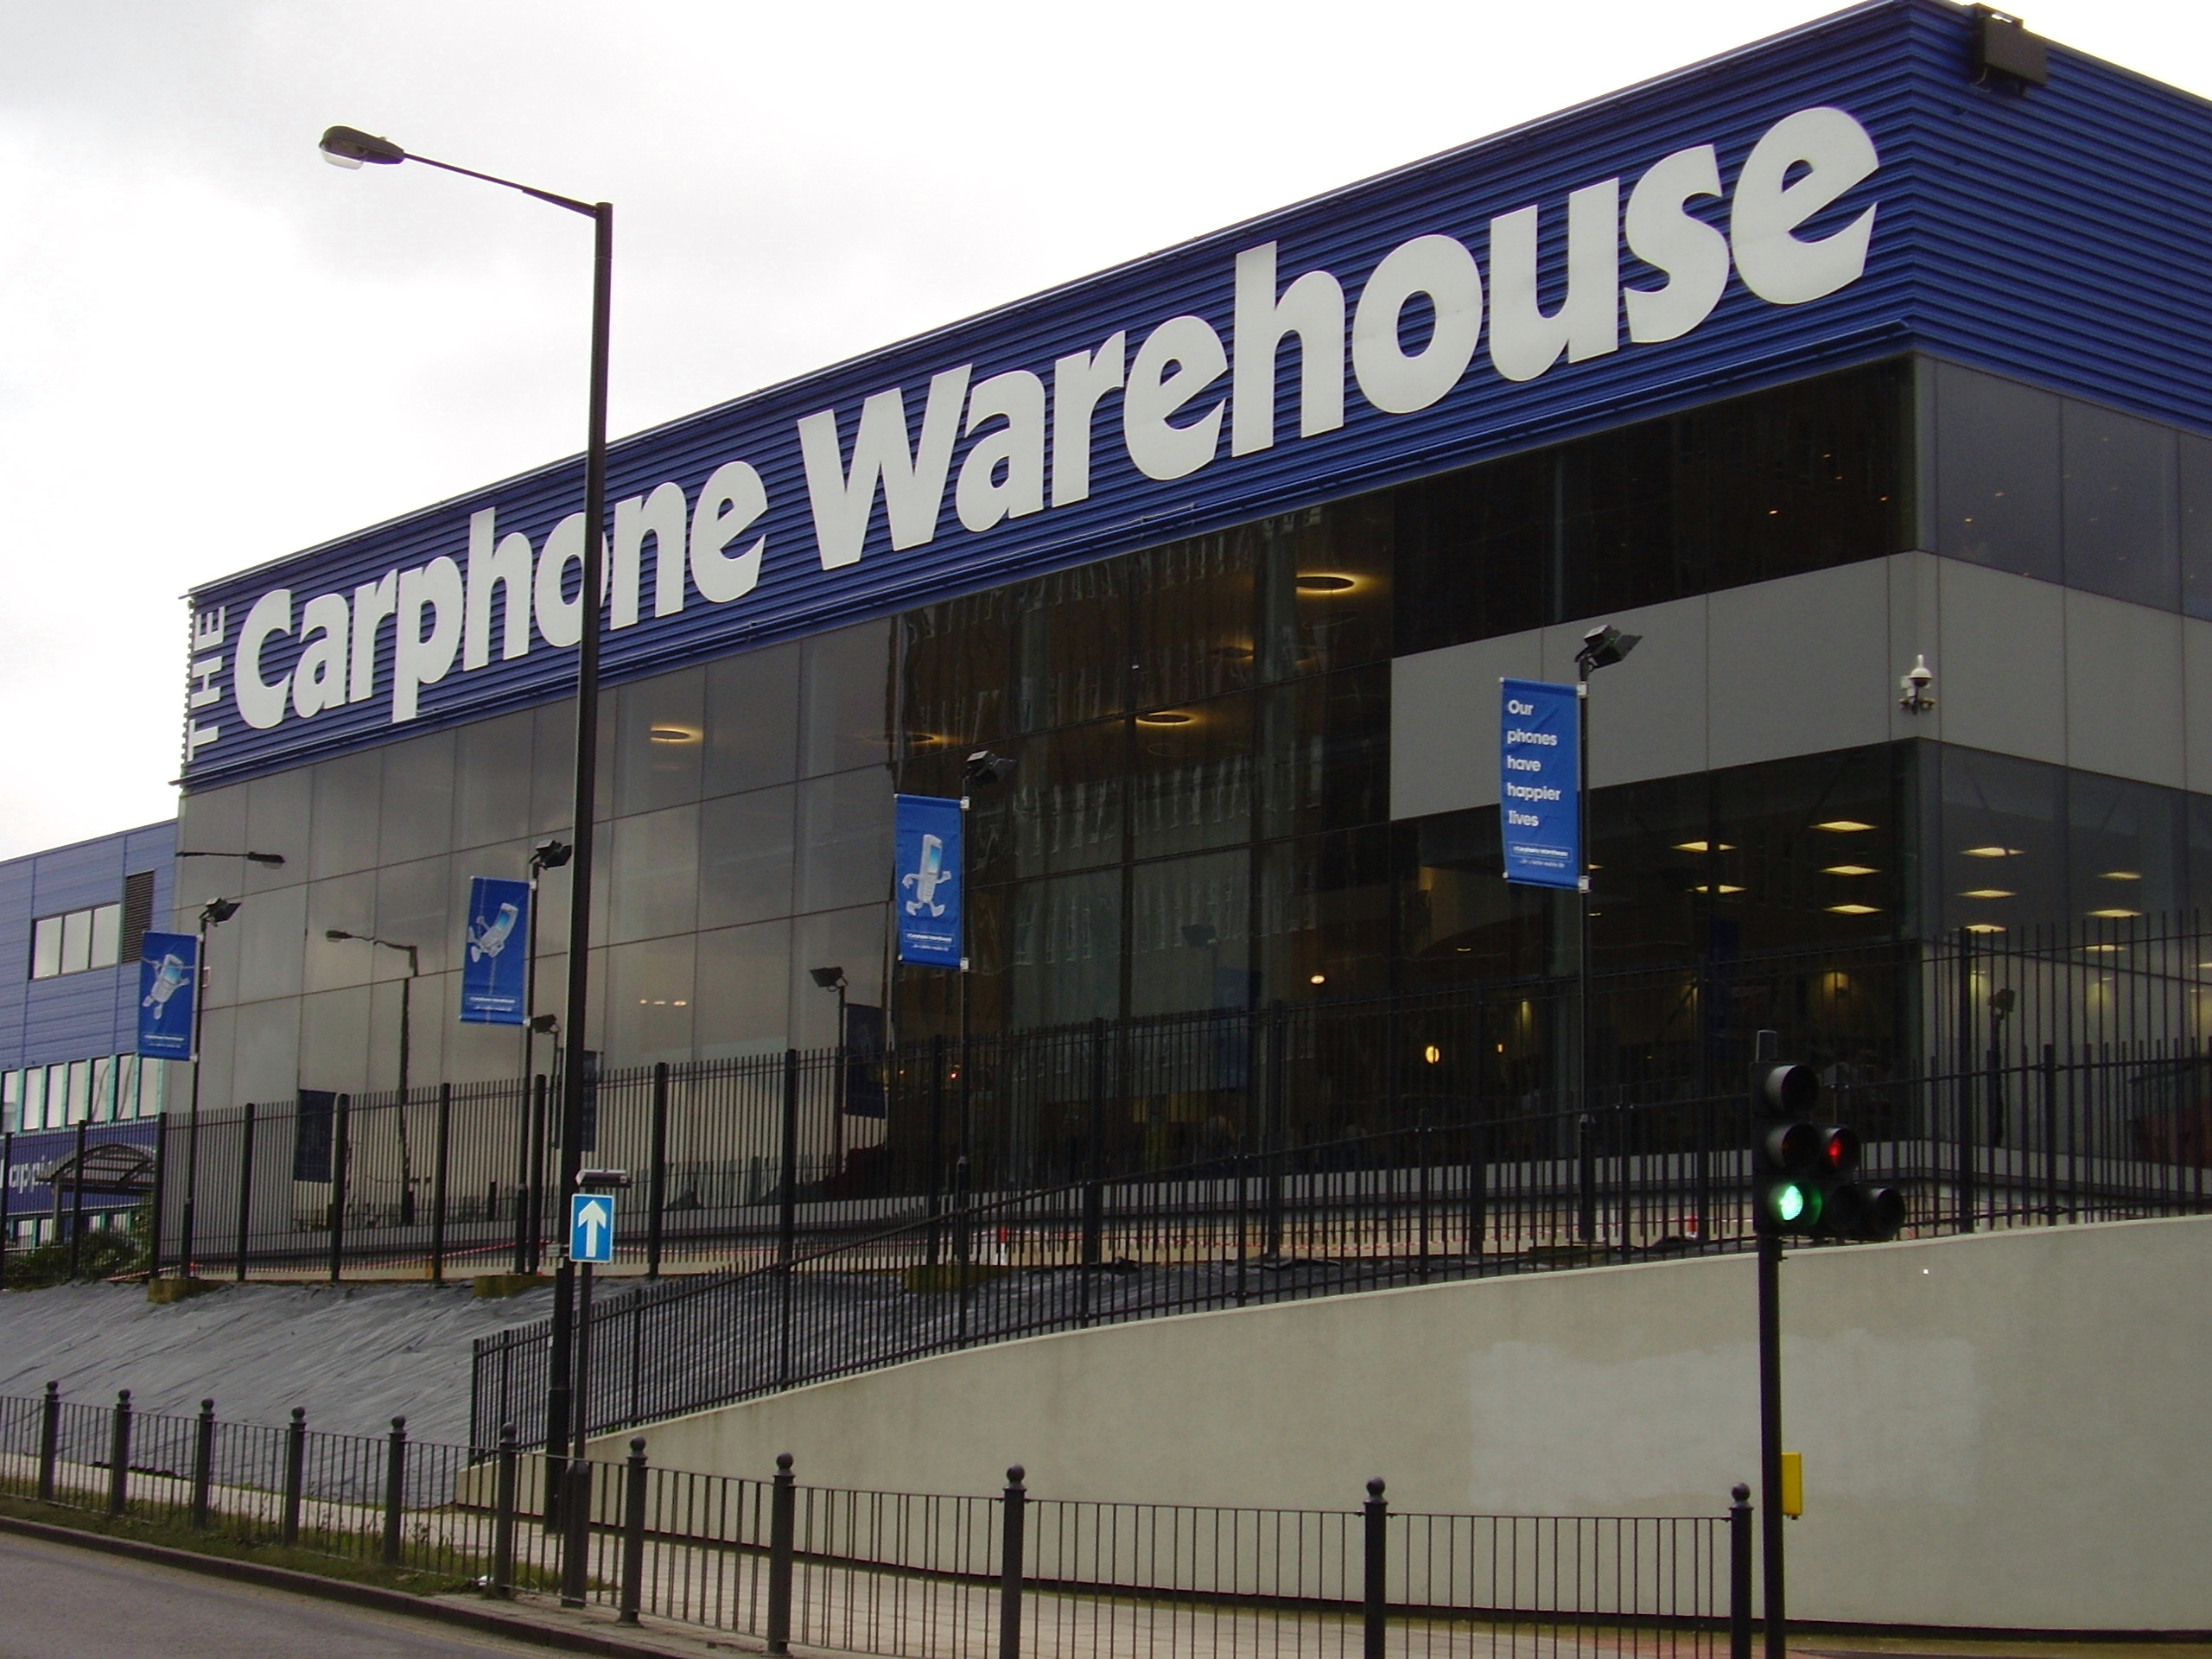 carphone warehouse - photo #16